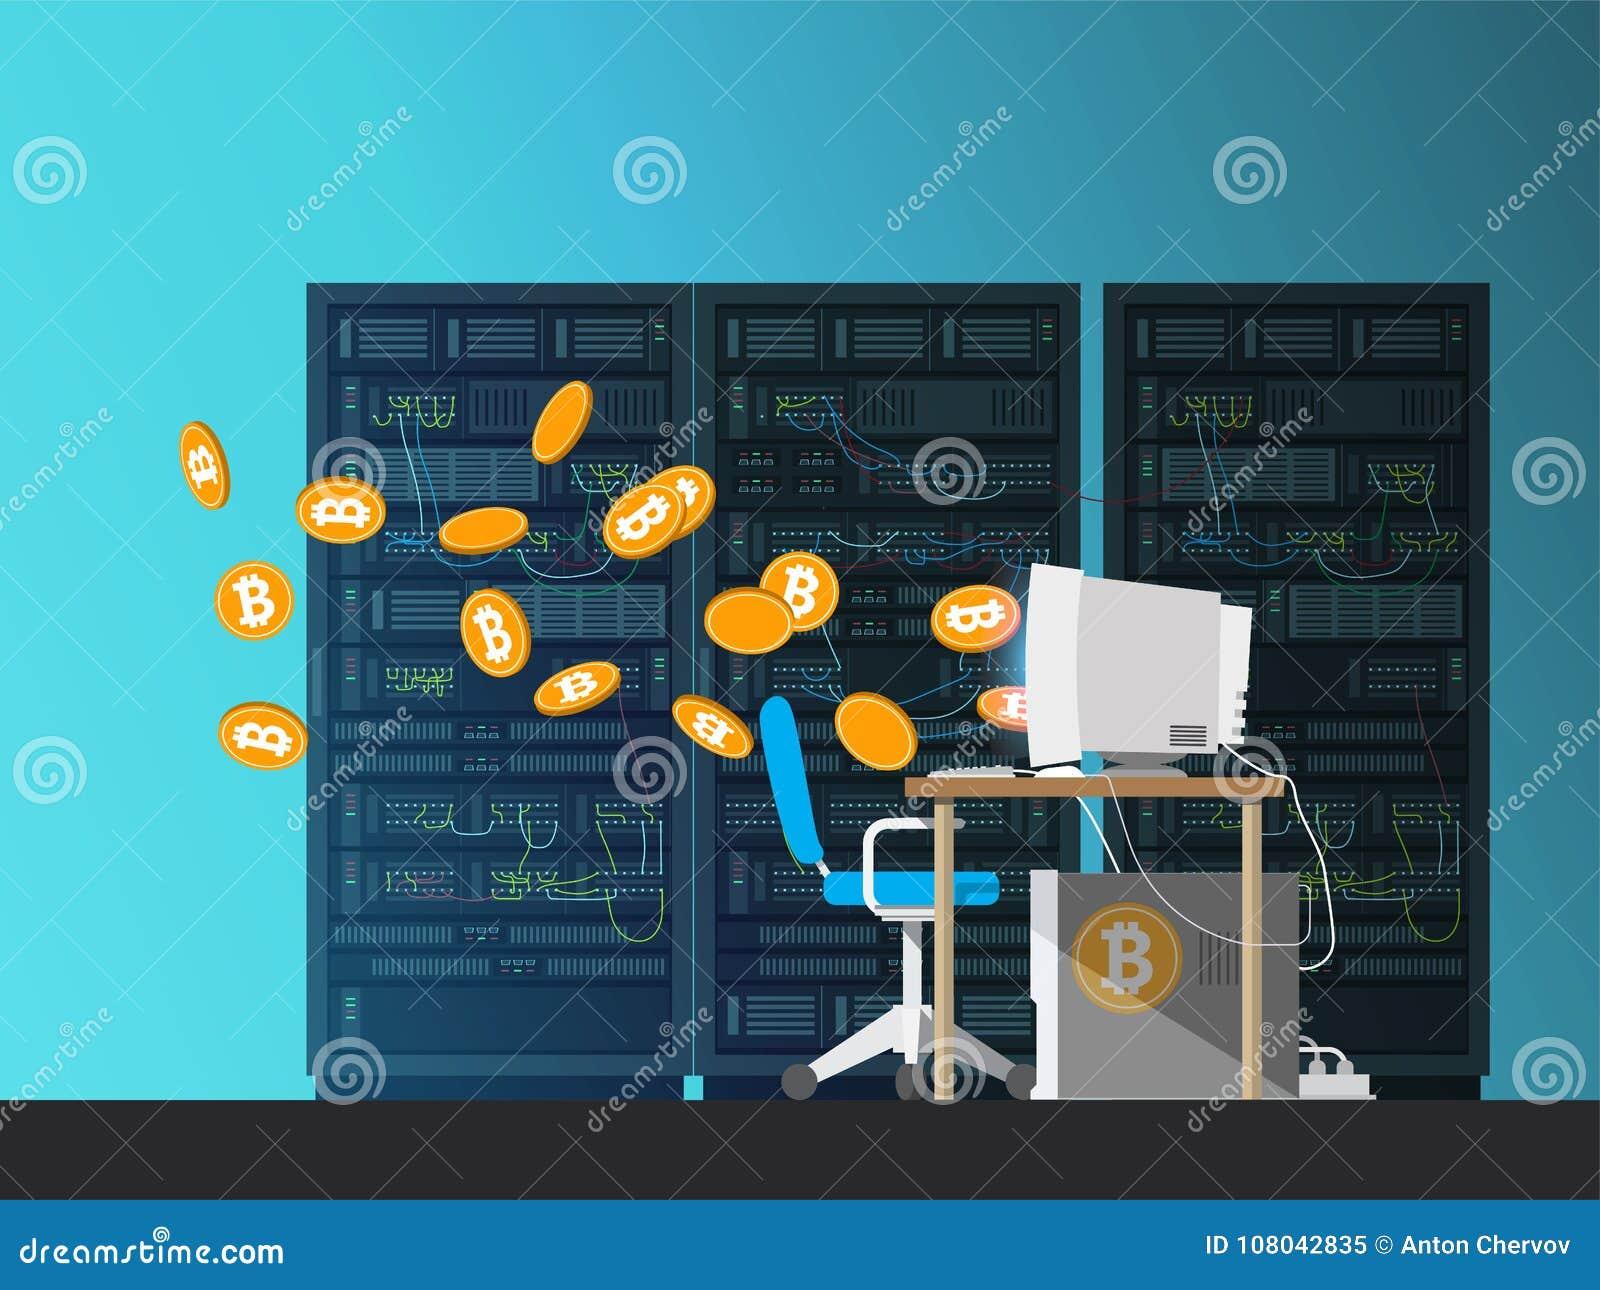 cryptocurrency exchange server